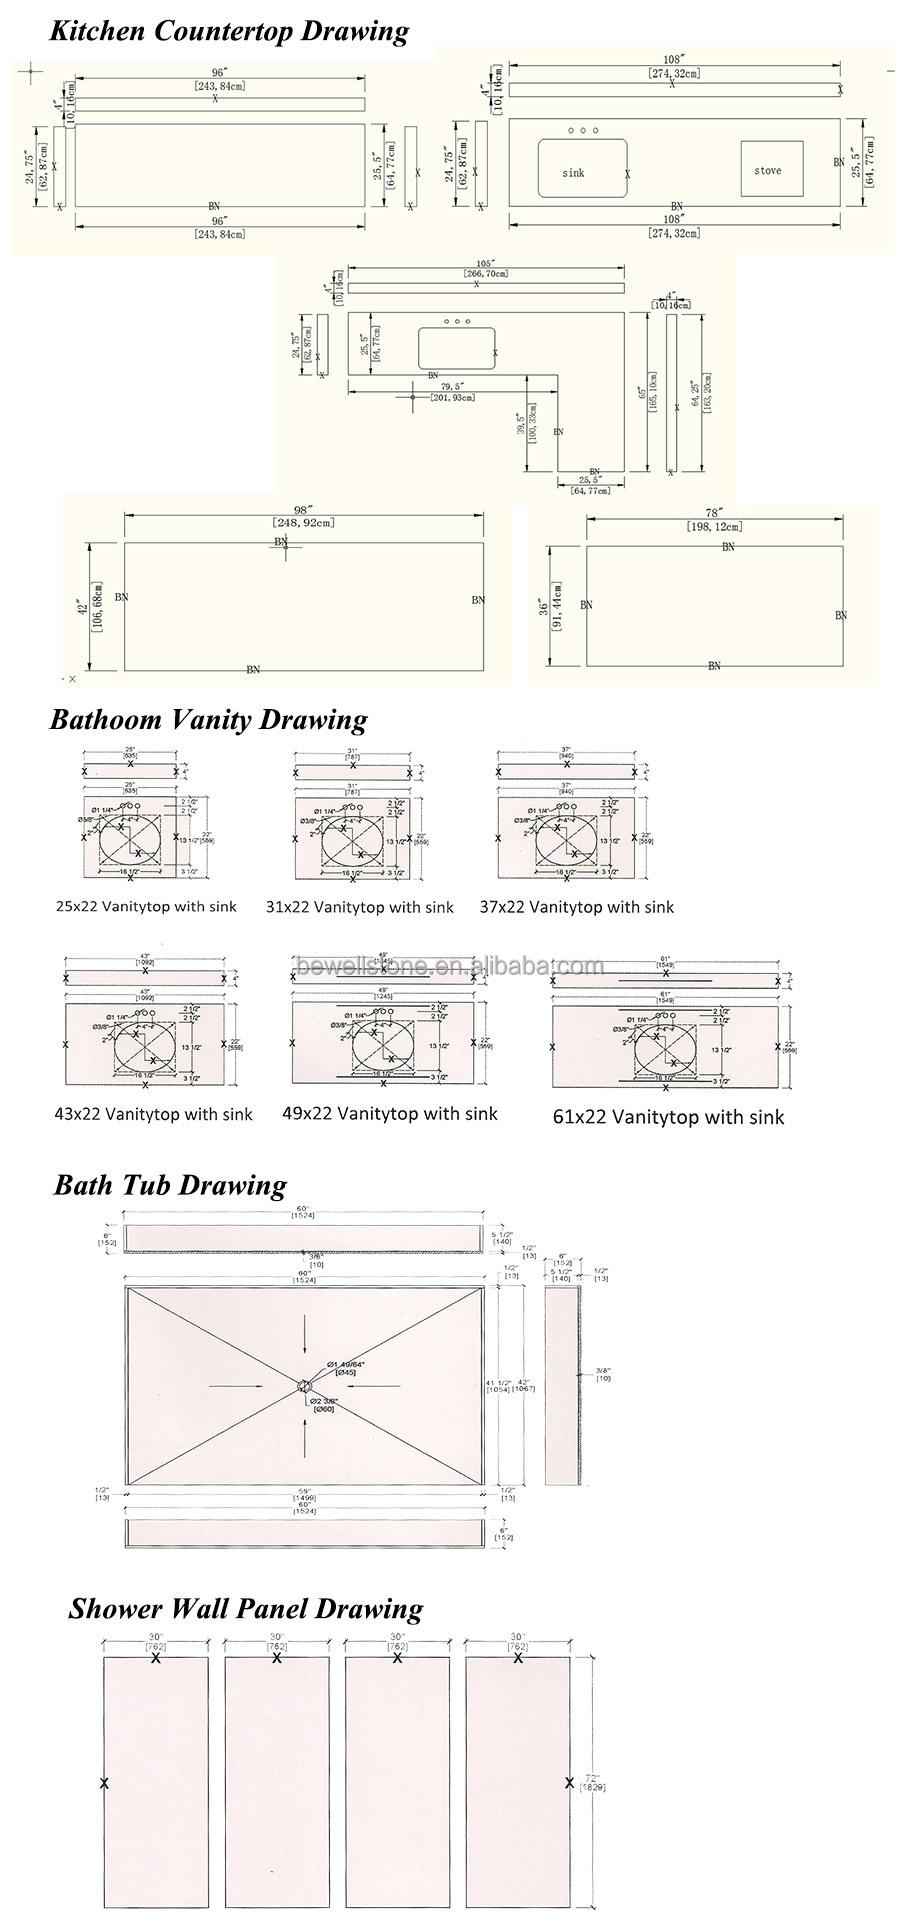 Raw Silk Brown Granite Silk Stone Countertops For Kitchen Use Buy Silk Stone Countertops Brown